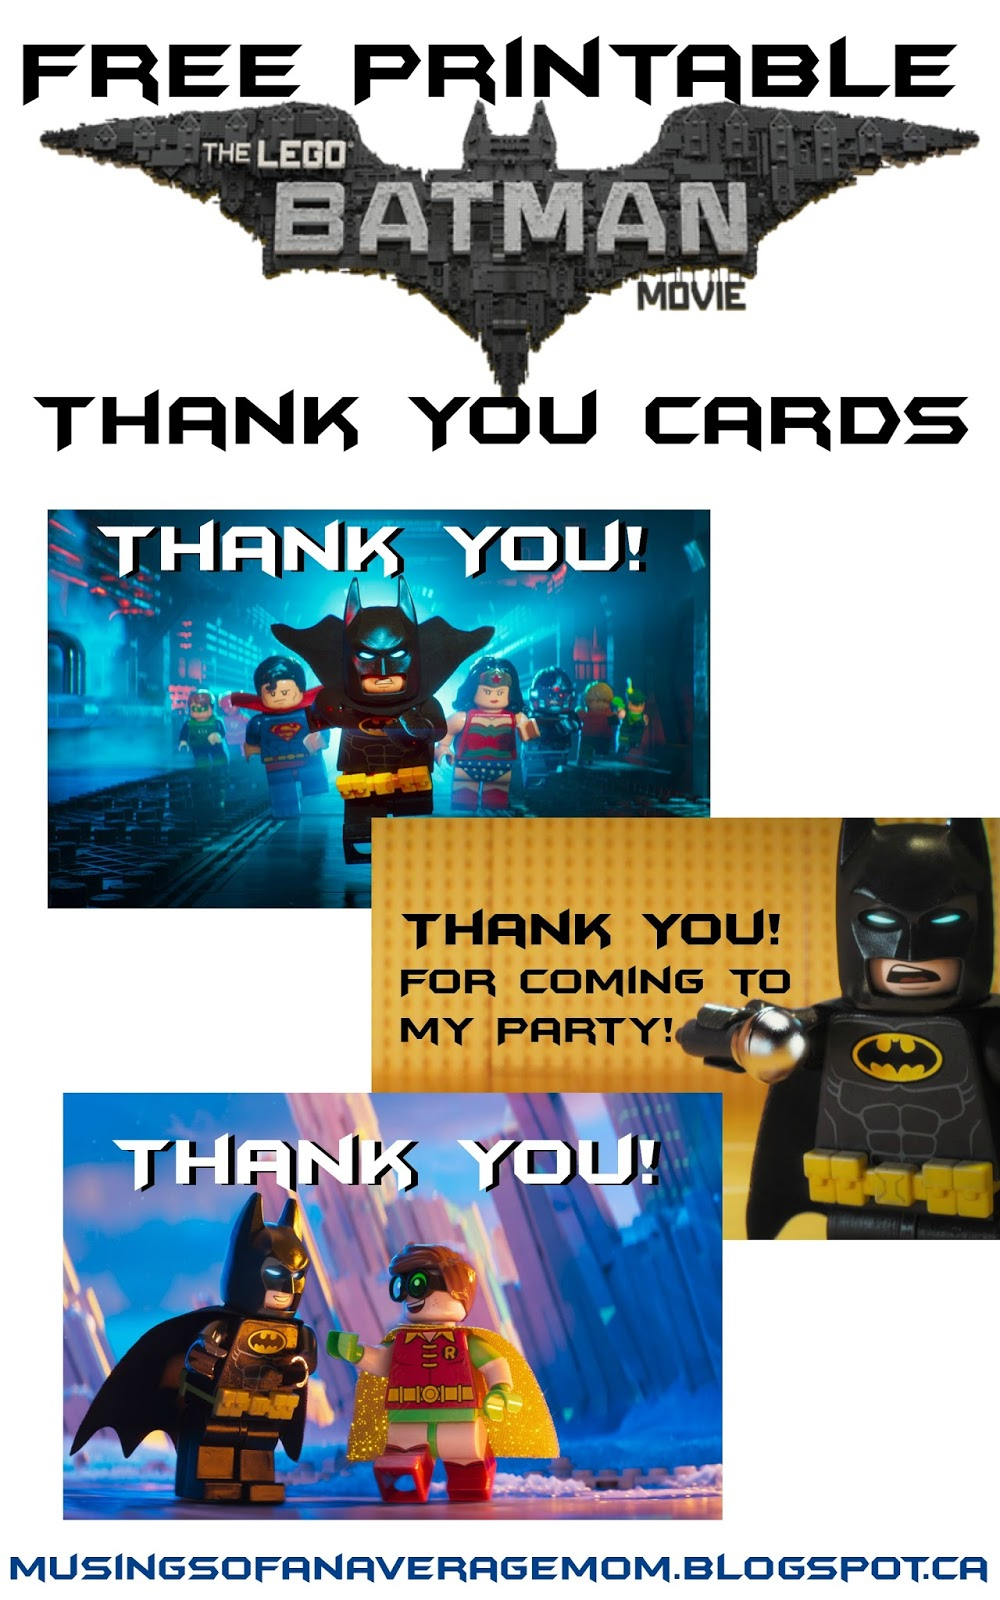 Musings Of An Average Mom: Lego Batman Thank You Cards - Free Printable Lego Batman